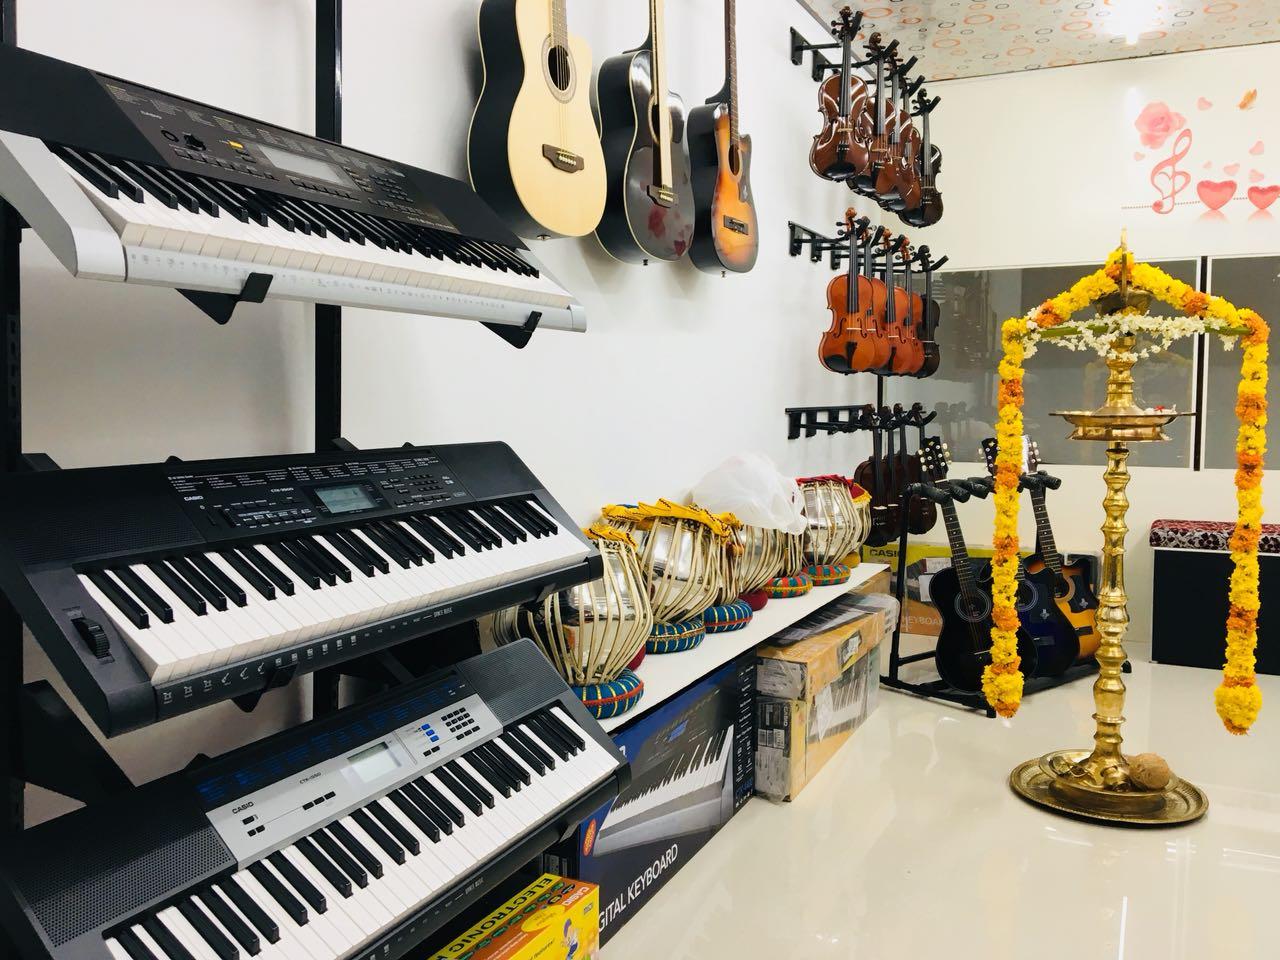 Top Vocal Music Classes in Karunagappally, Kollam - Singing Classes